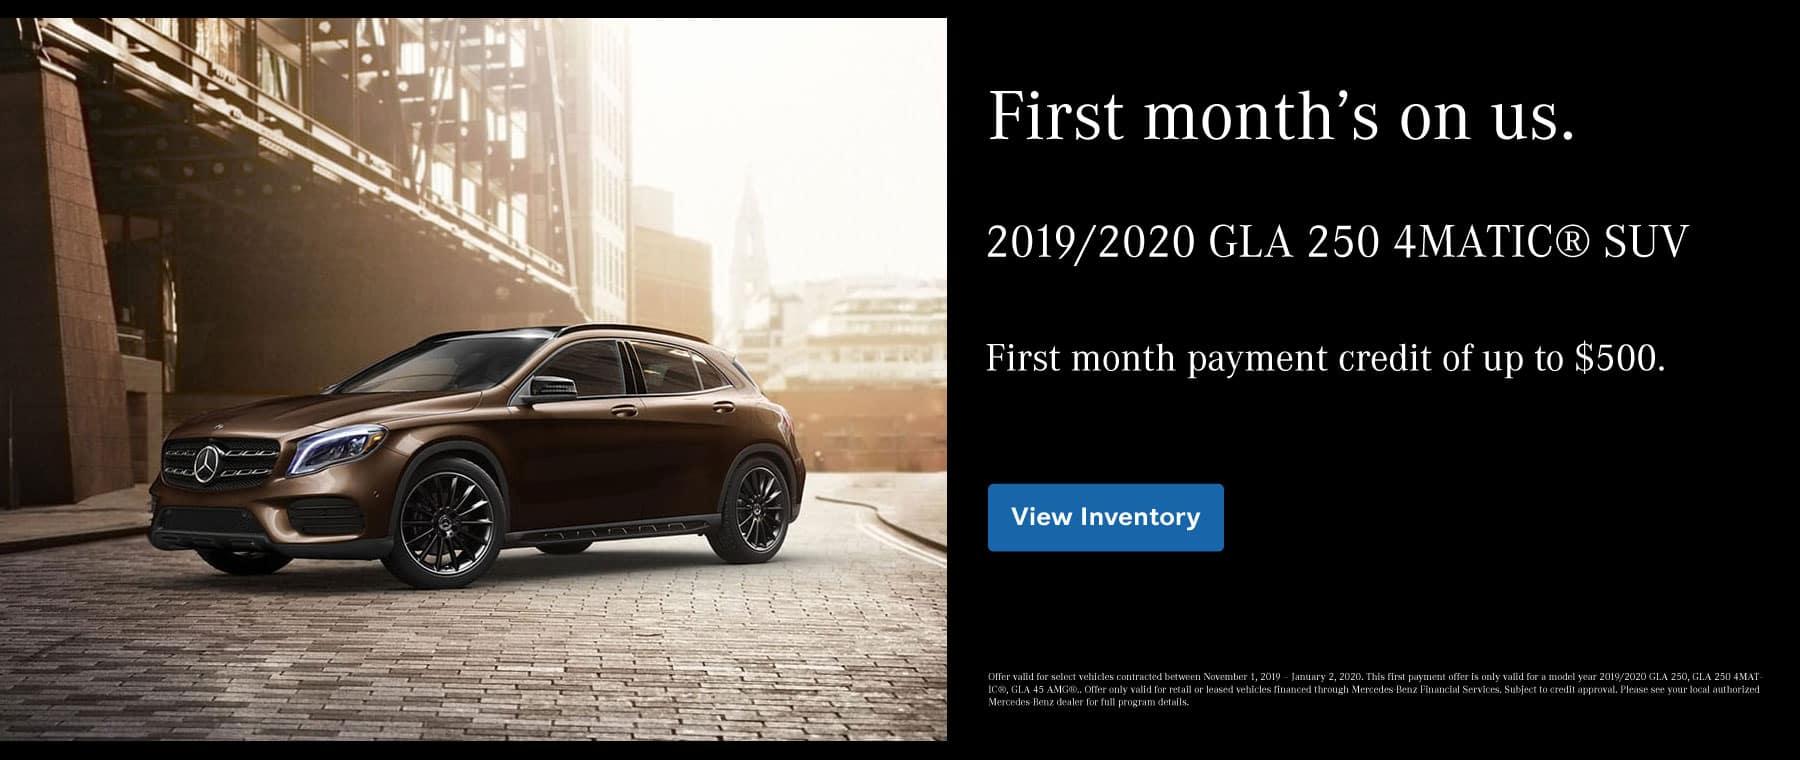 GLA Credit Payment